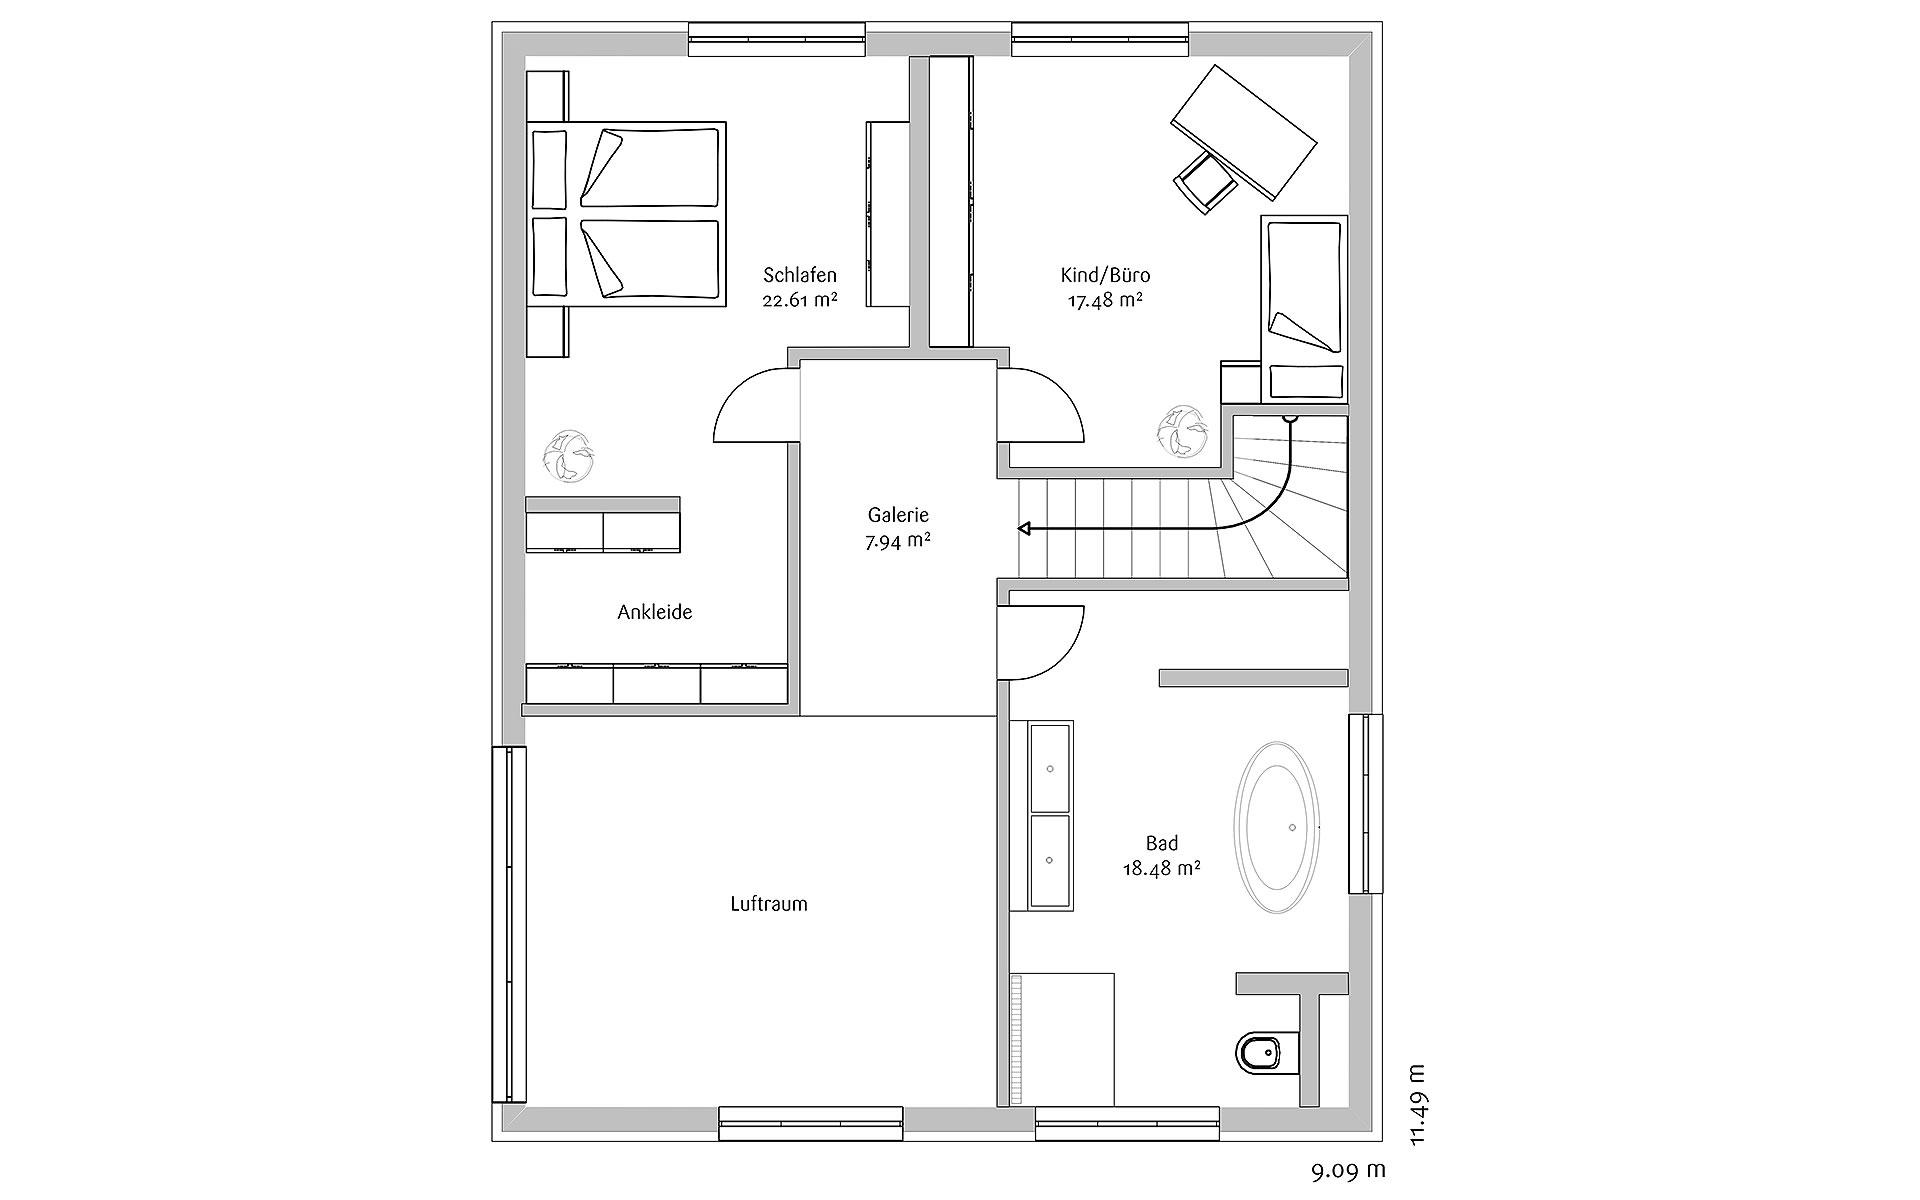 Dachgeschoss LaVita extraordinary von FischerHaus GmbH & Co. KG